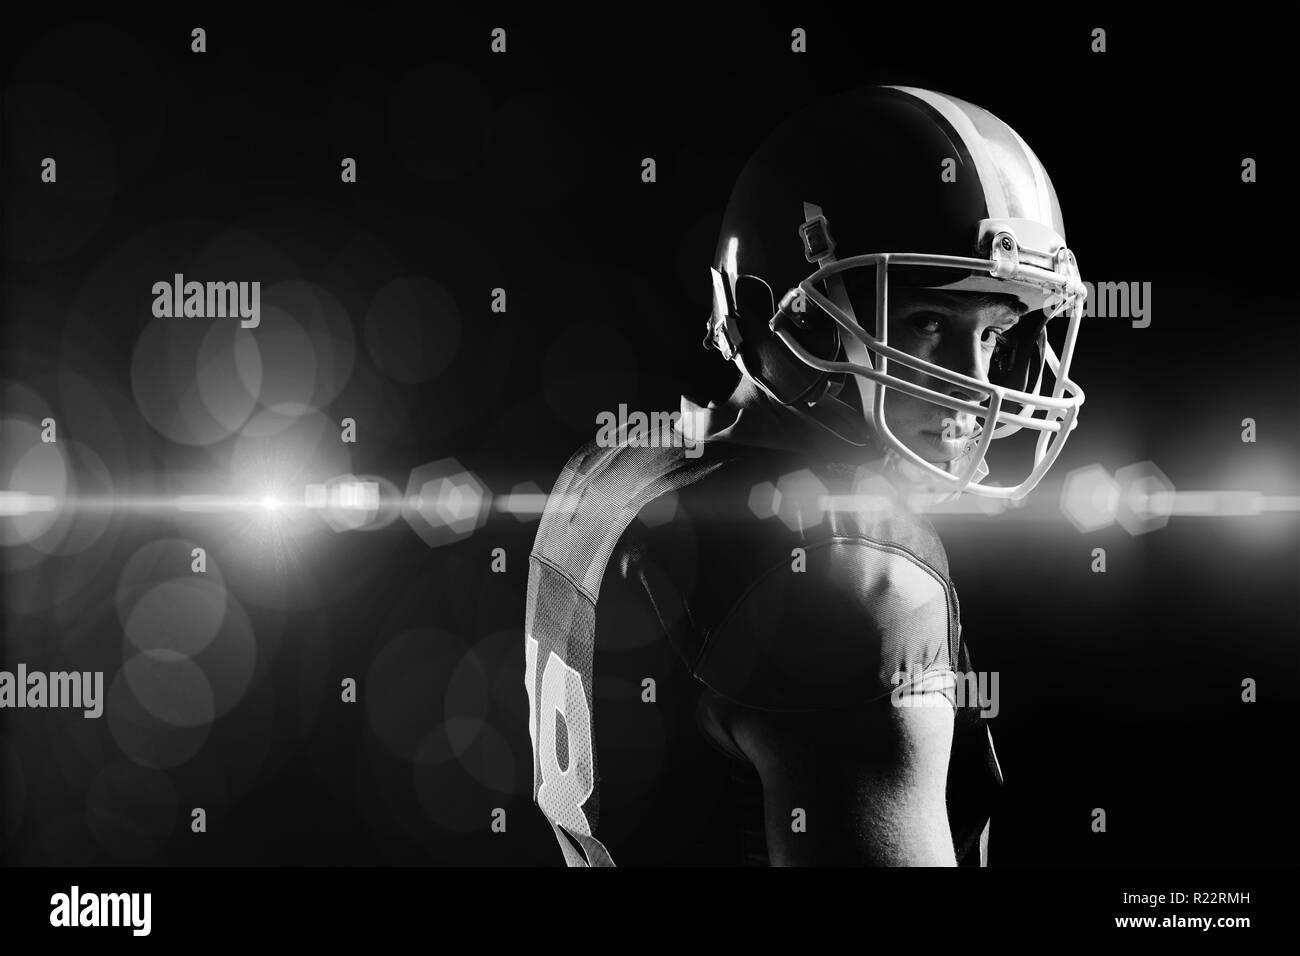 American football player in helmet standing against black background - Stock Image